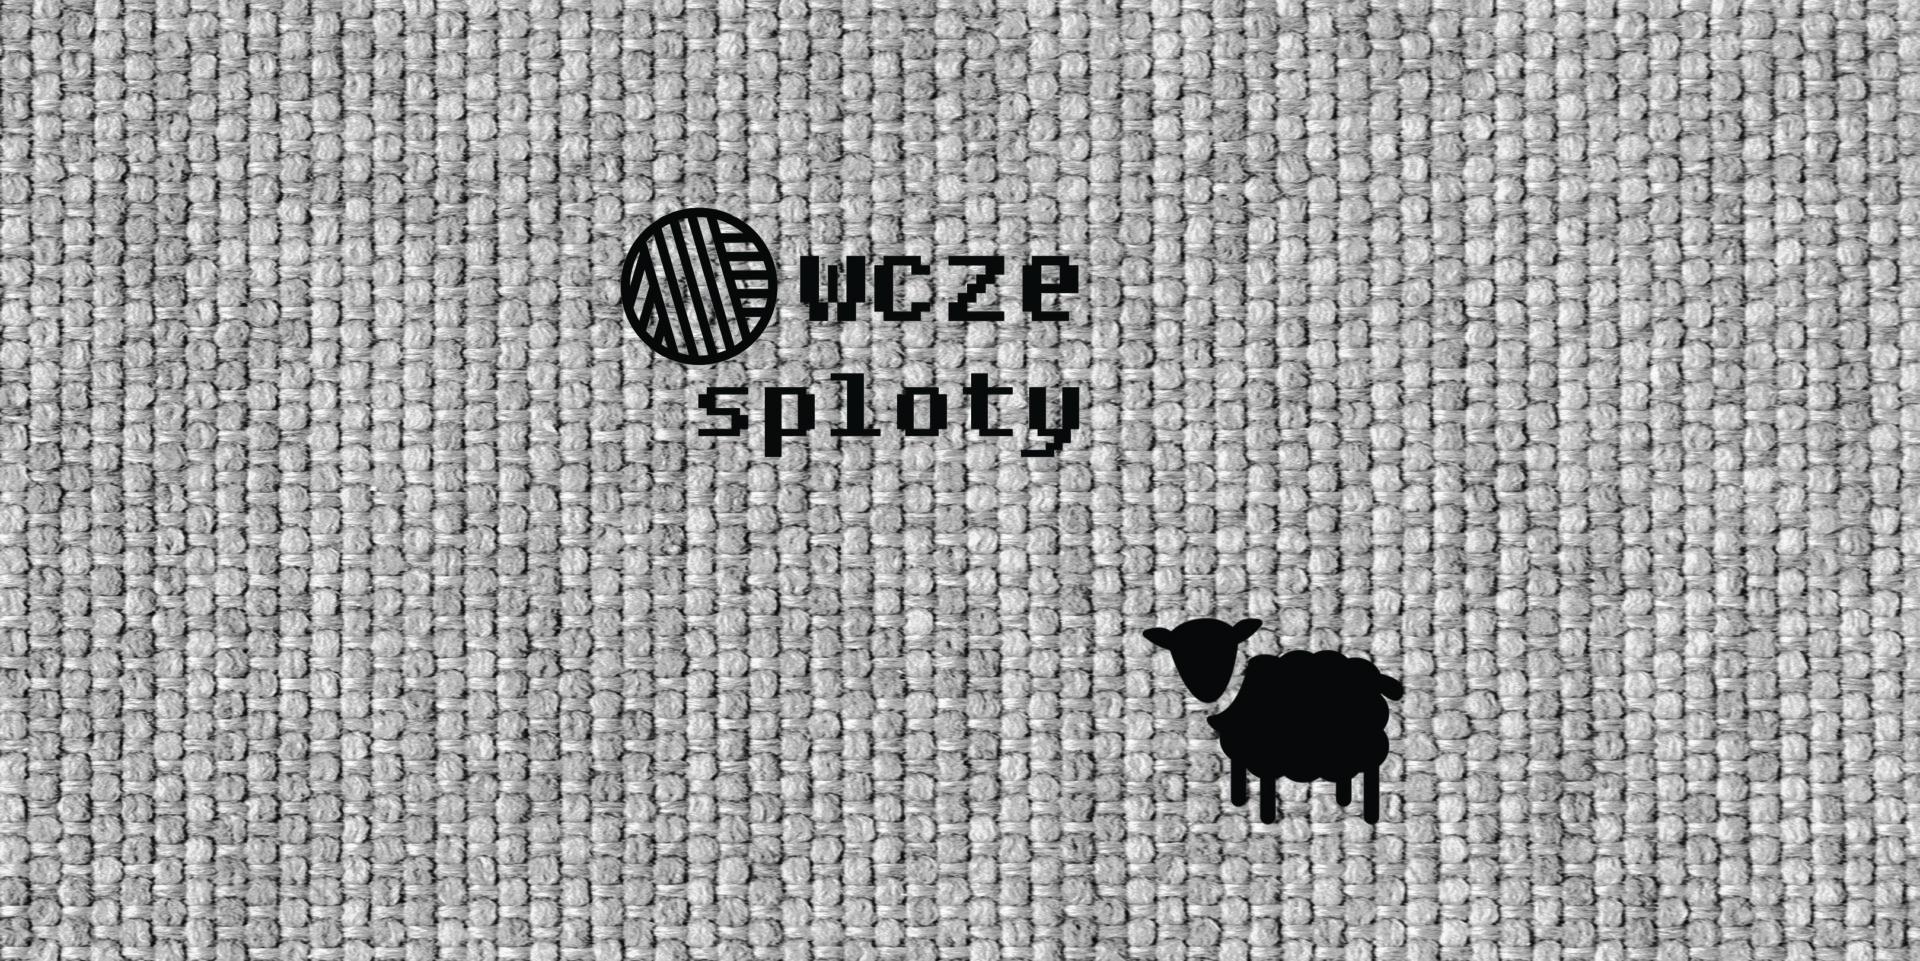 owcze_sploty